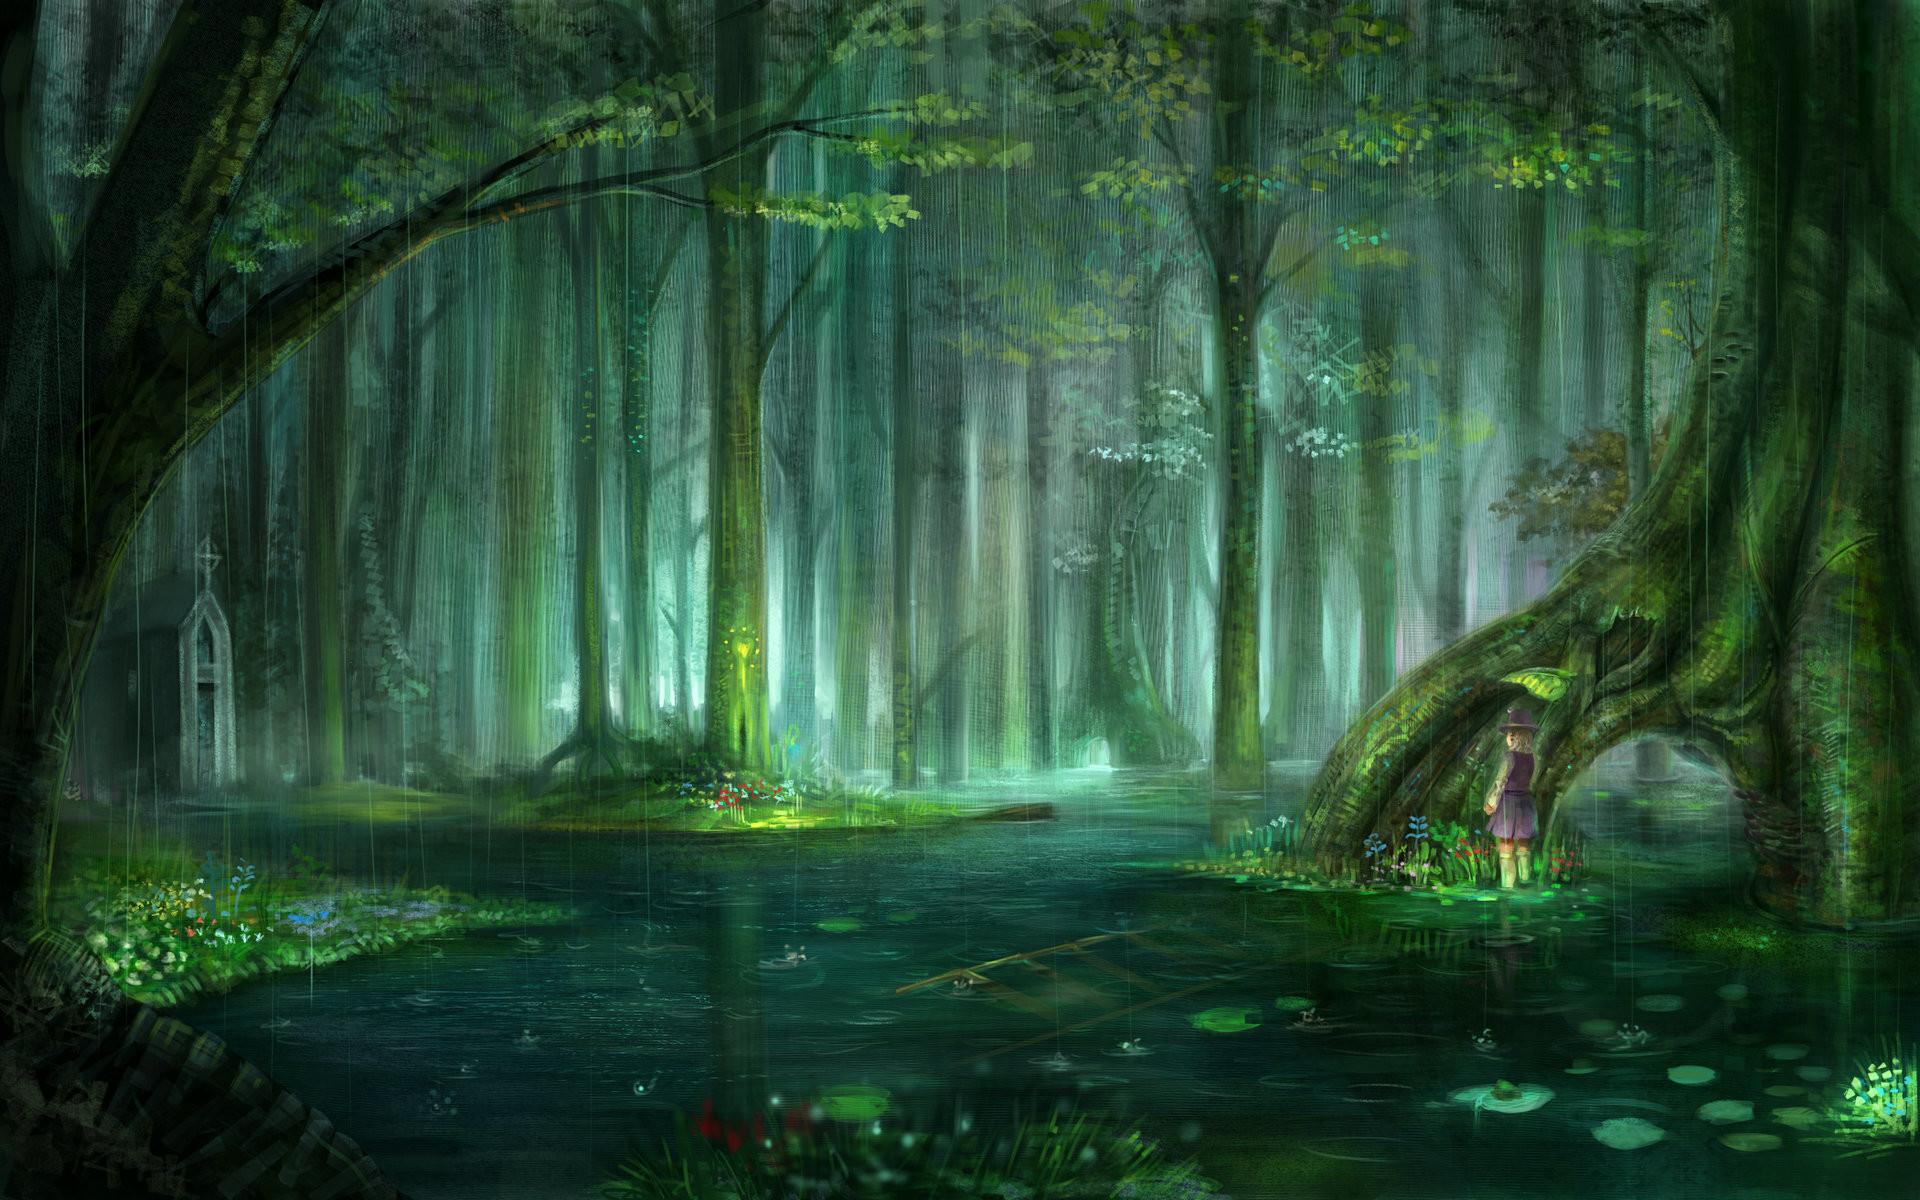 1920x1200 Enchanted Forest Desktop Wallpaper